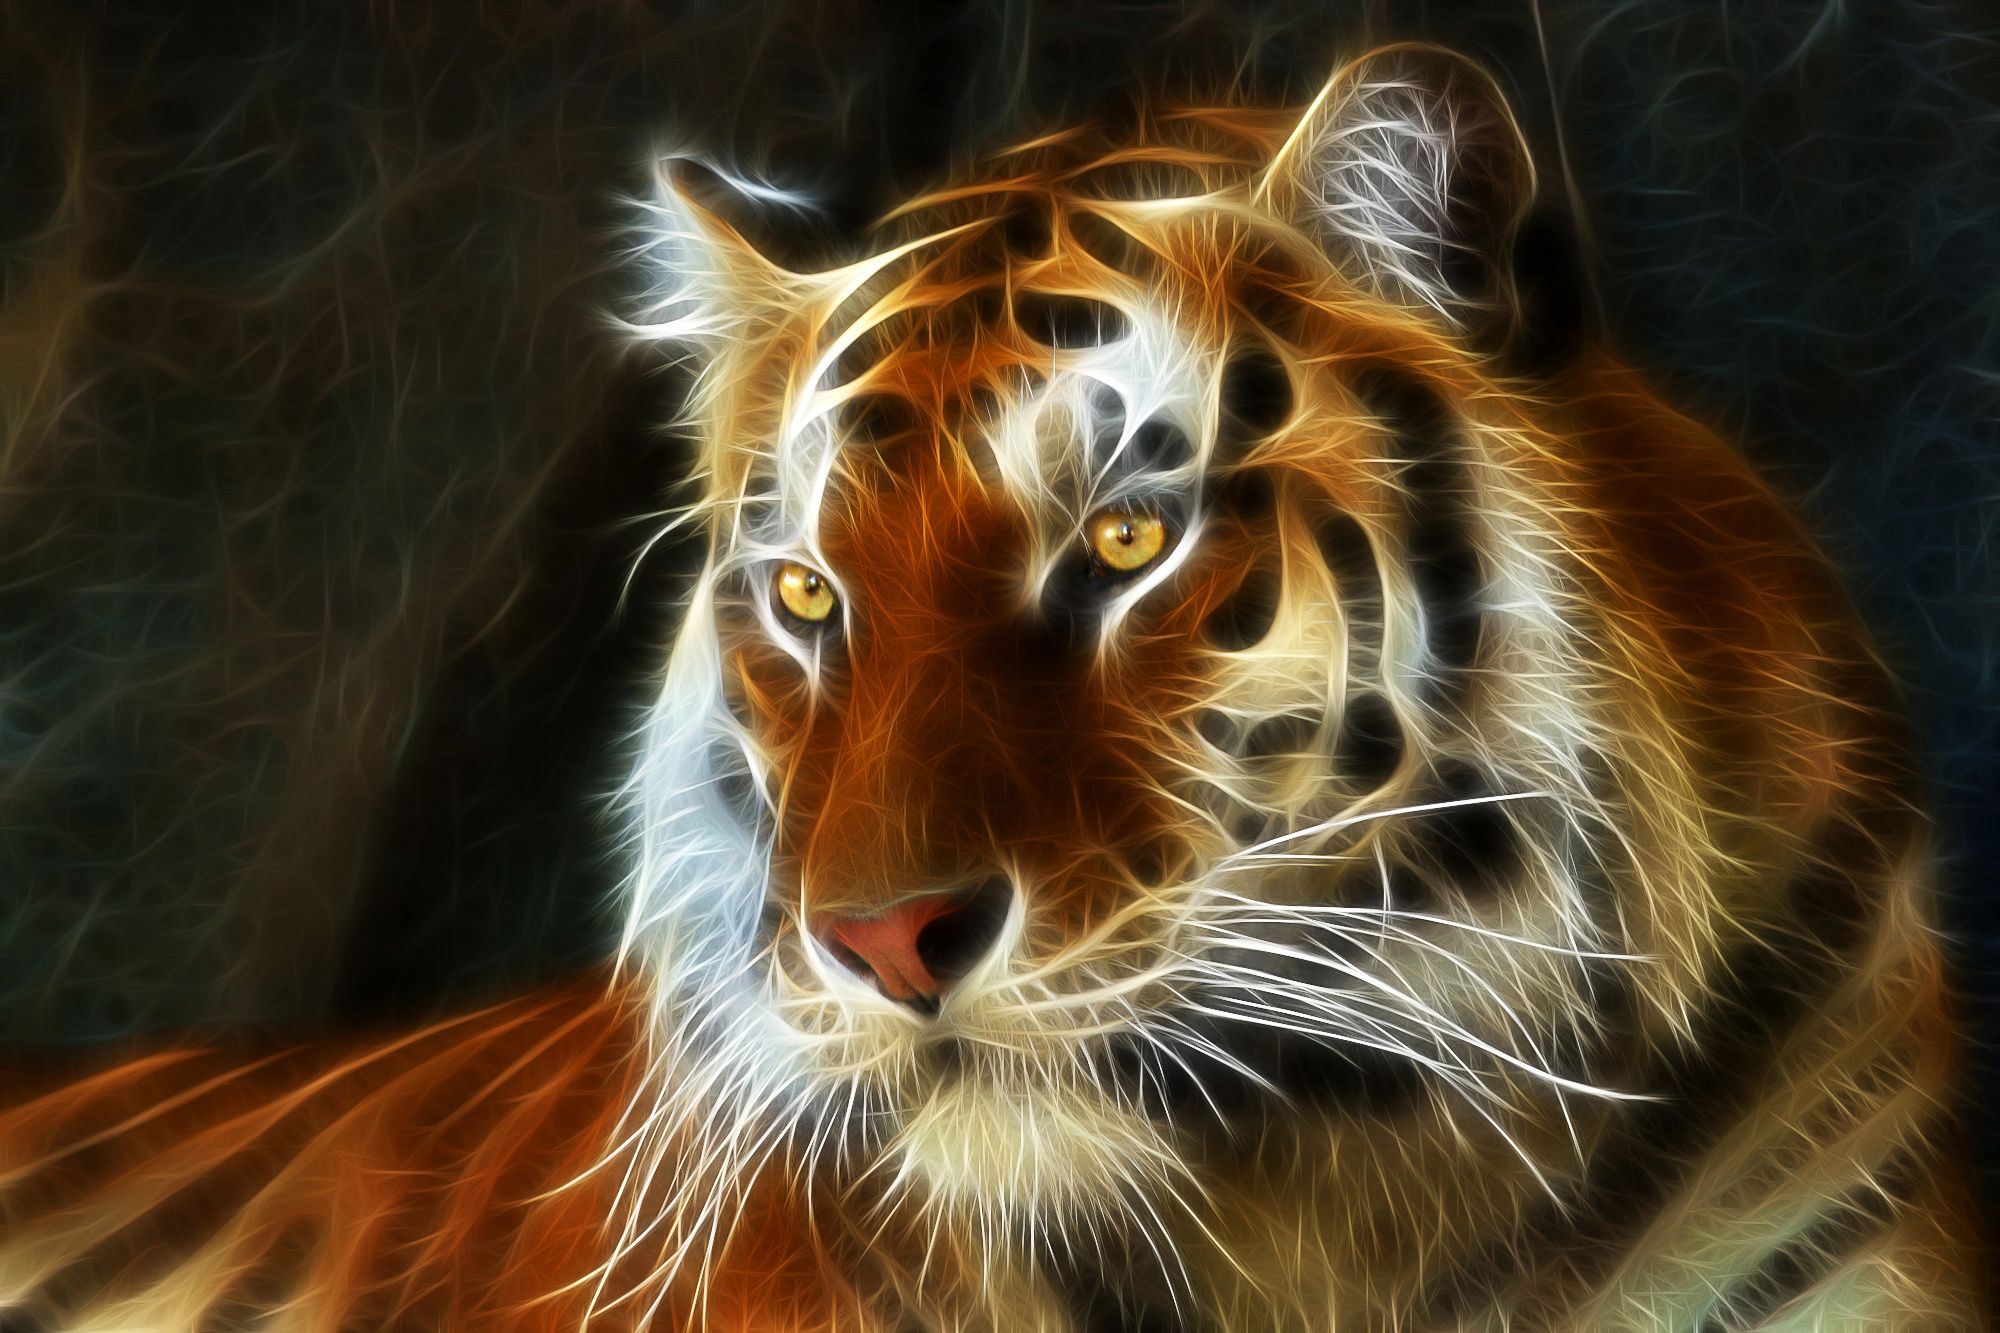 Tiger images 3d animals wallpapers tiger wallpaper - 3d animal wallpaper ...